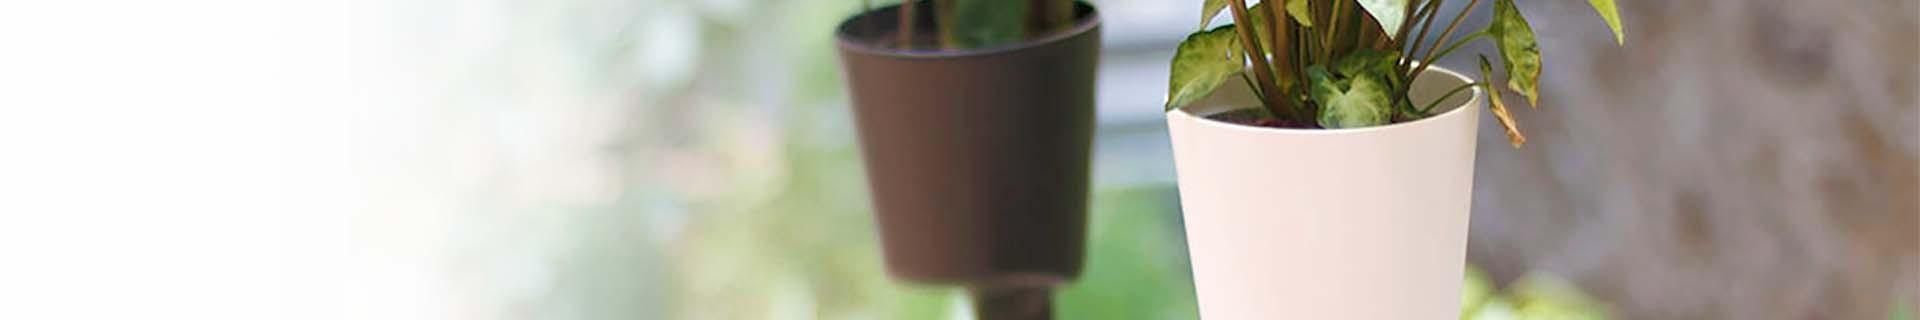 Selbstbewässernder vertikaler Blumentopf mit Pflanzen | CitySens